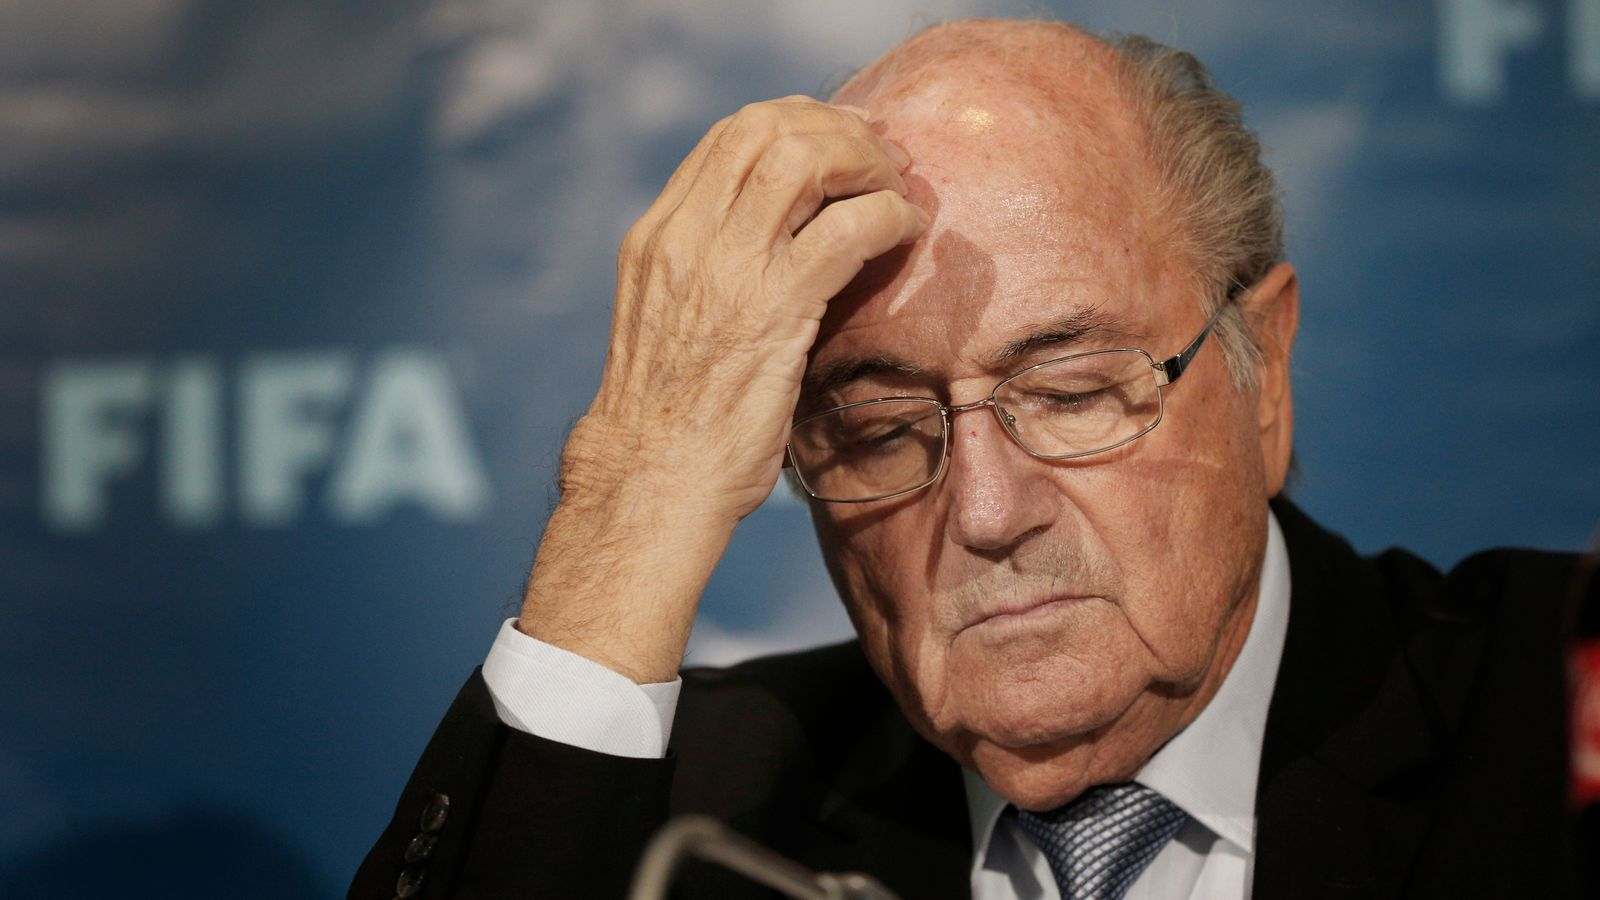 Sepp Blatter: Former FIFA president will not appeal against ban imposed last month